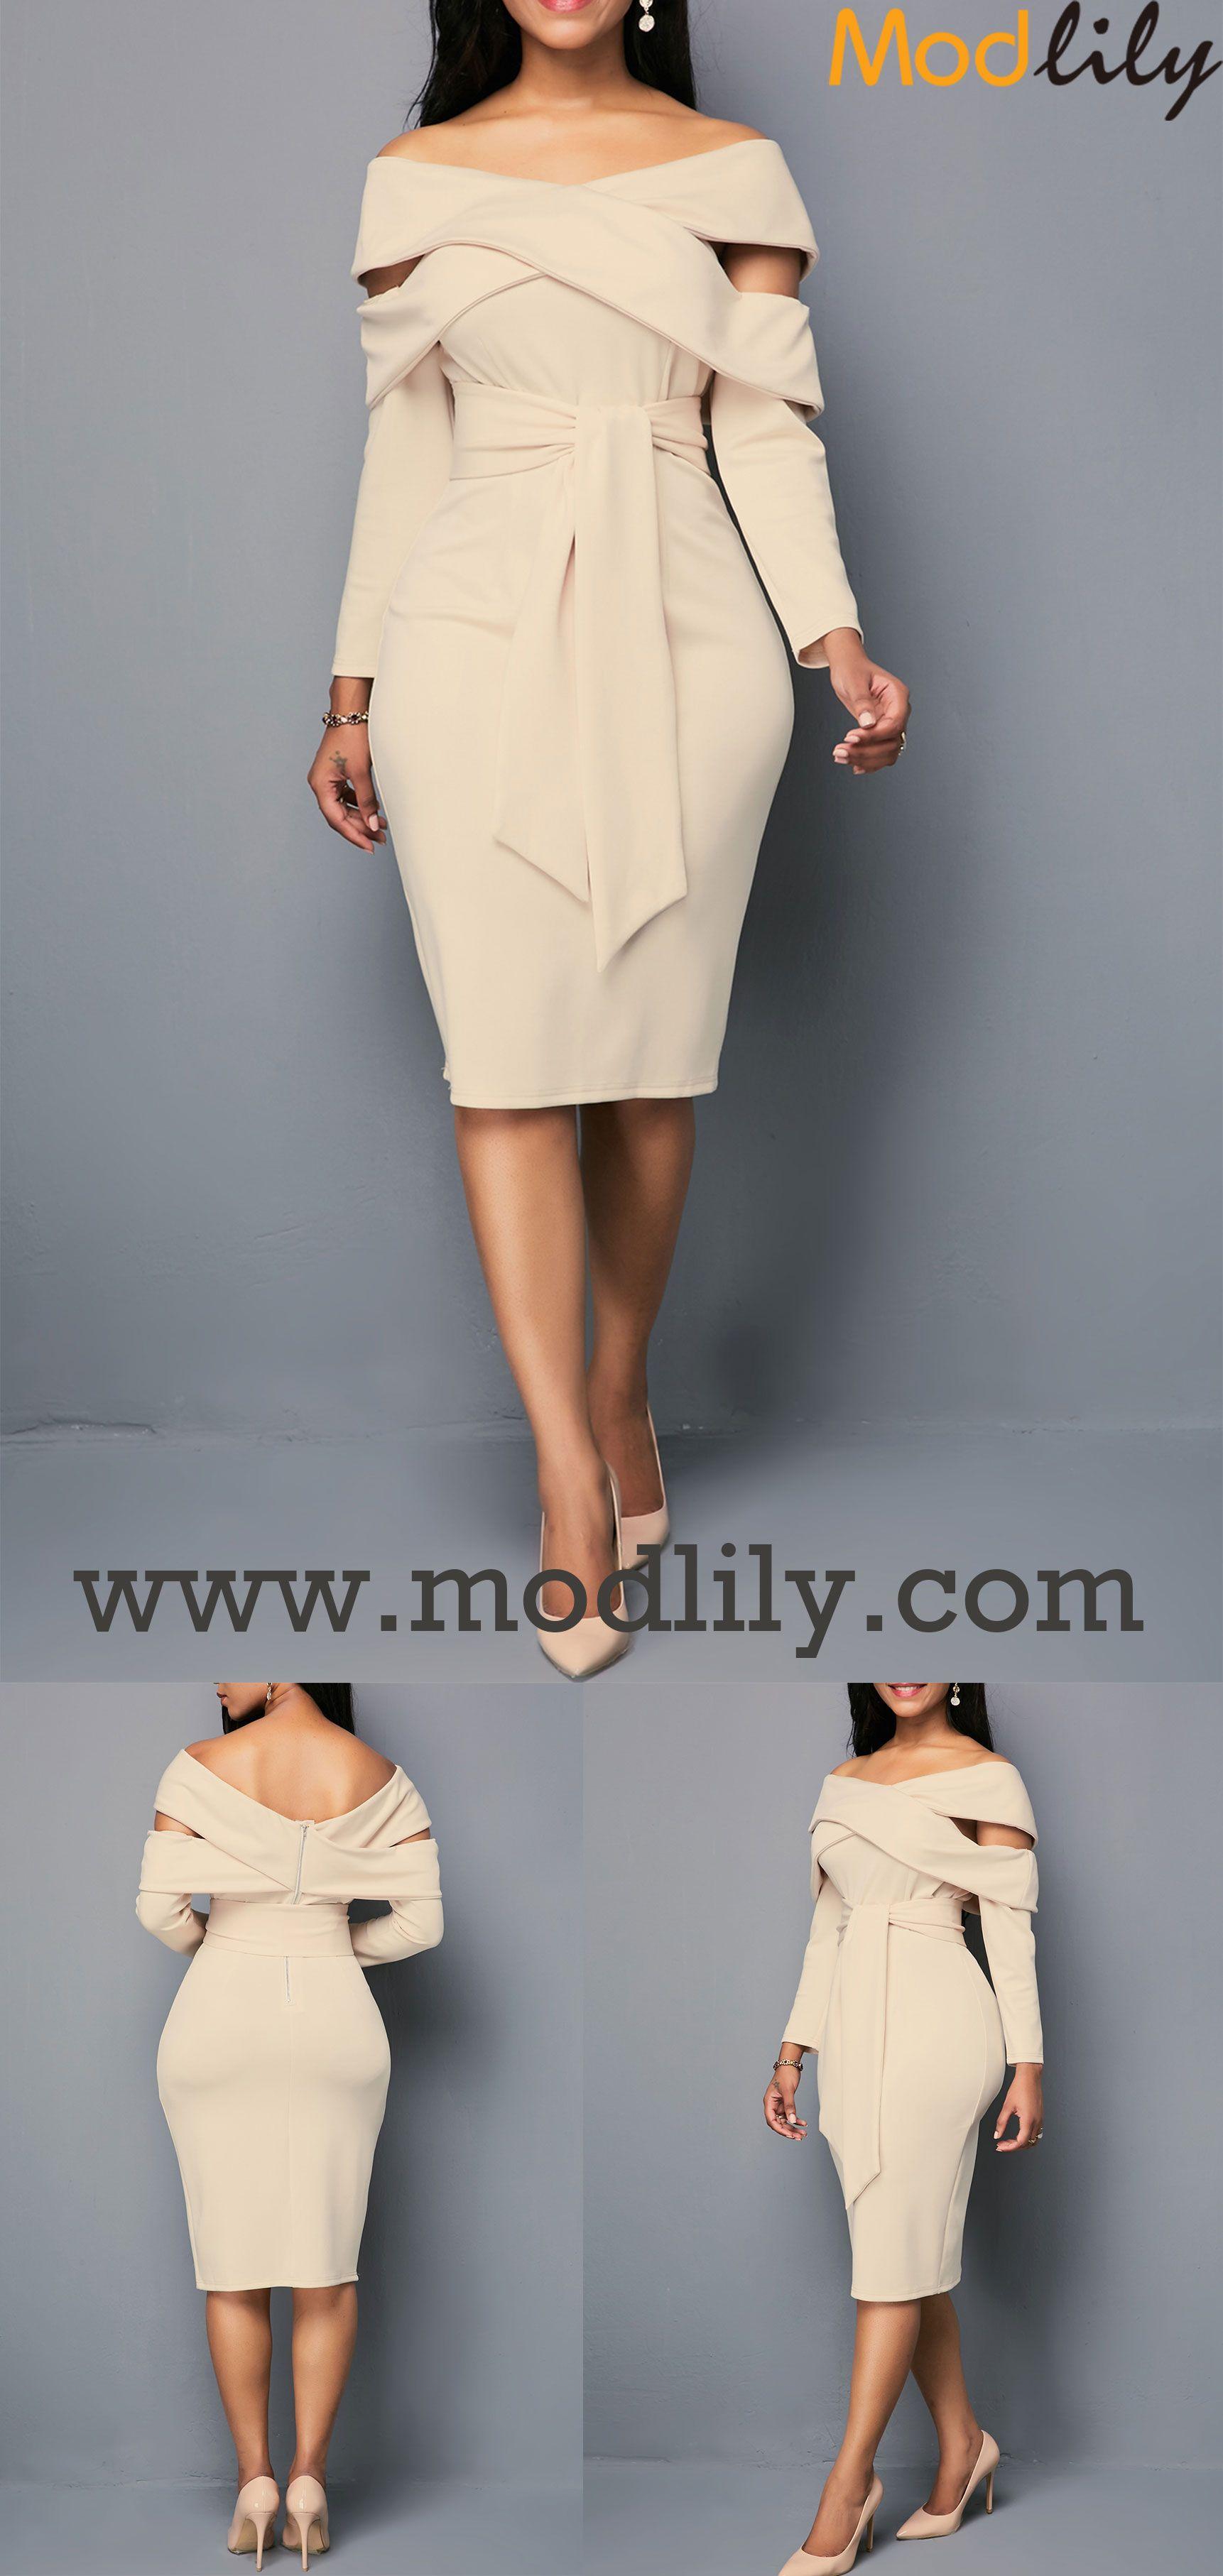 Zipper back light khaki belted sheath dress in dresses